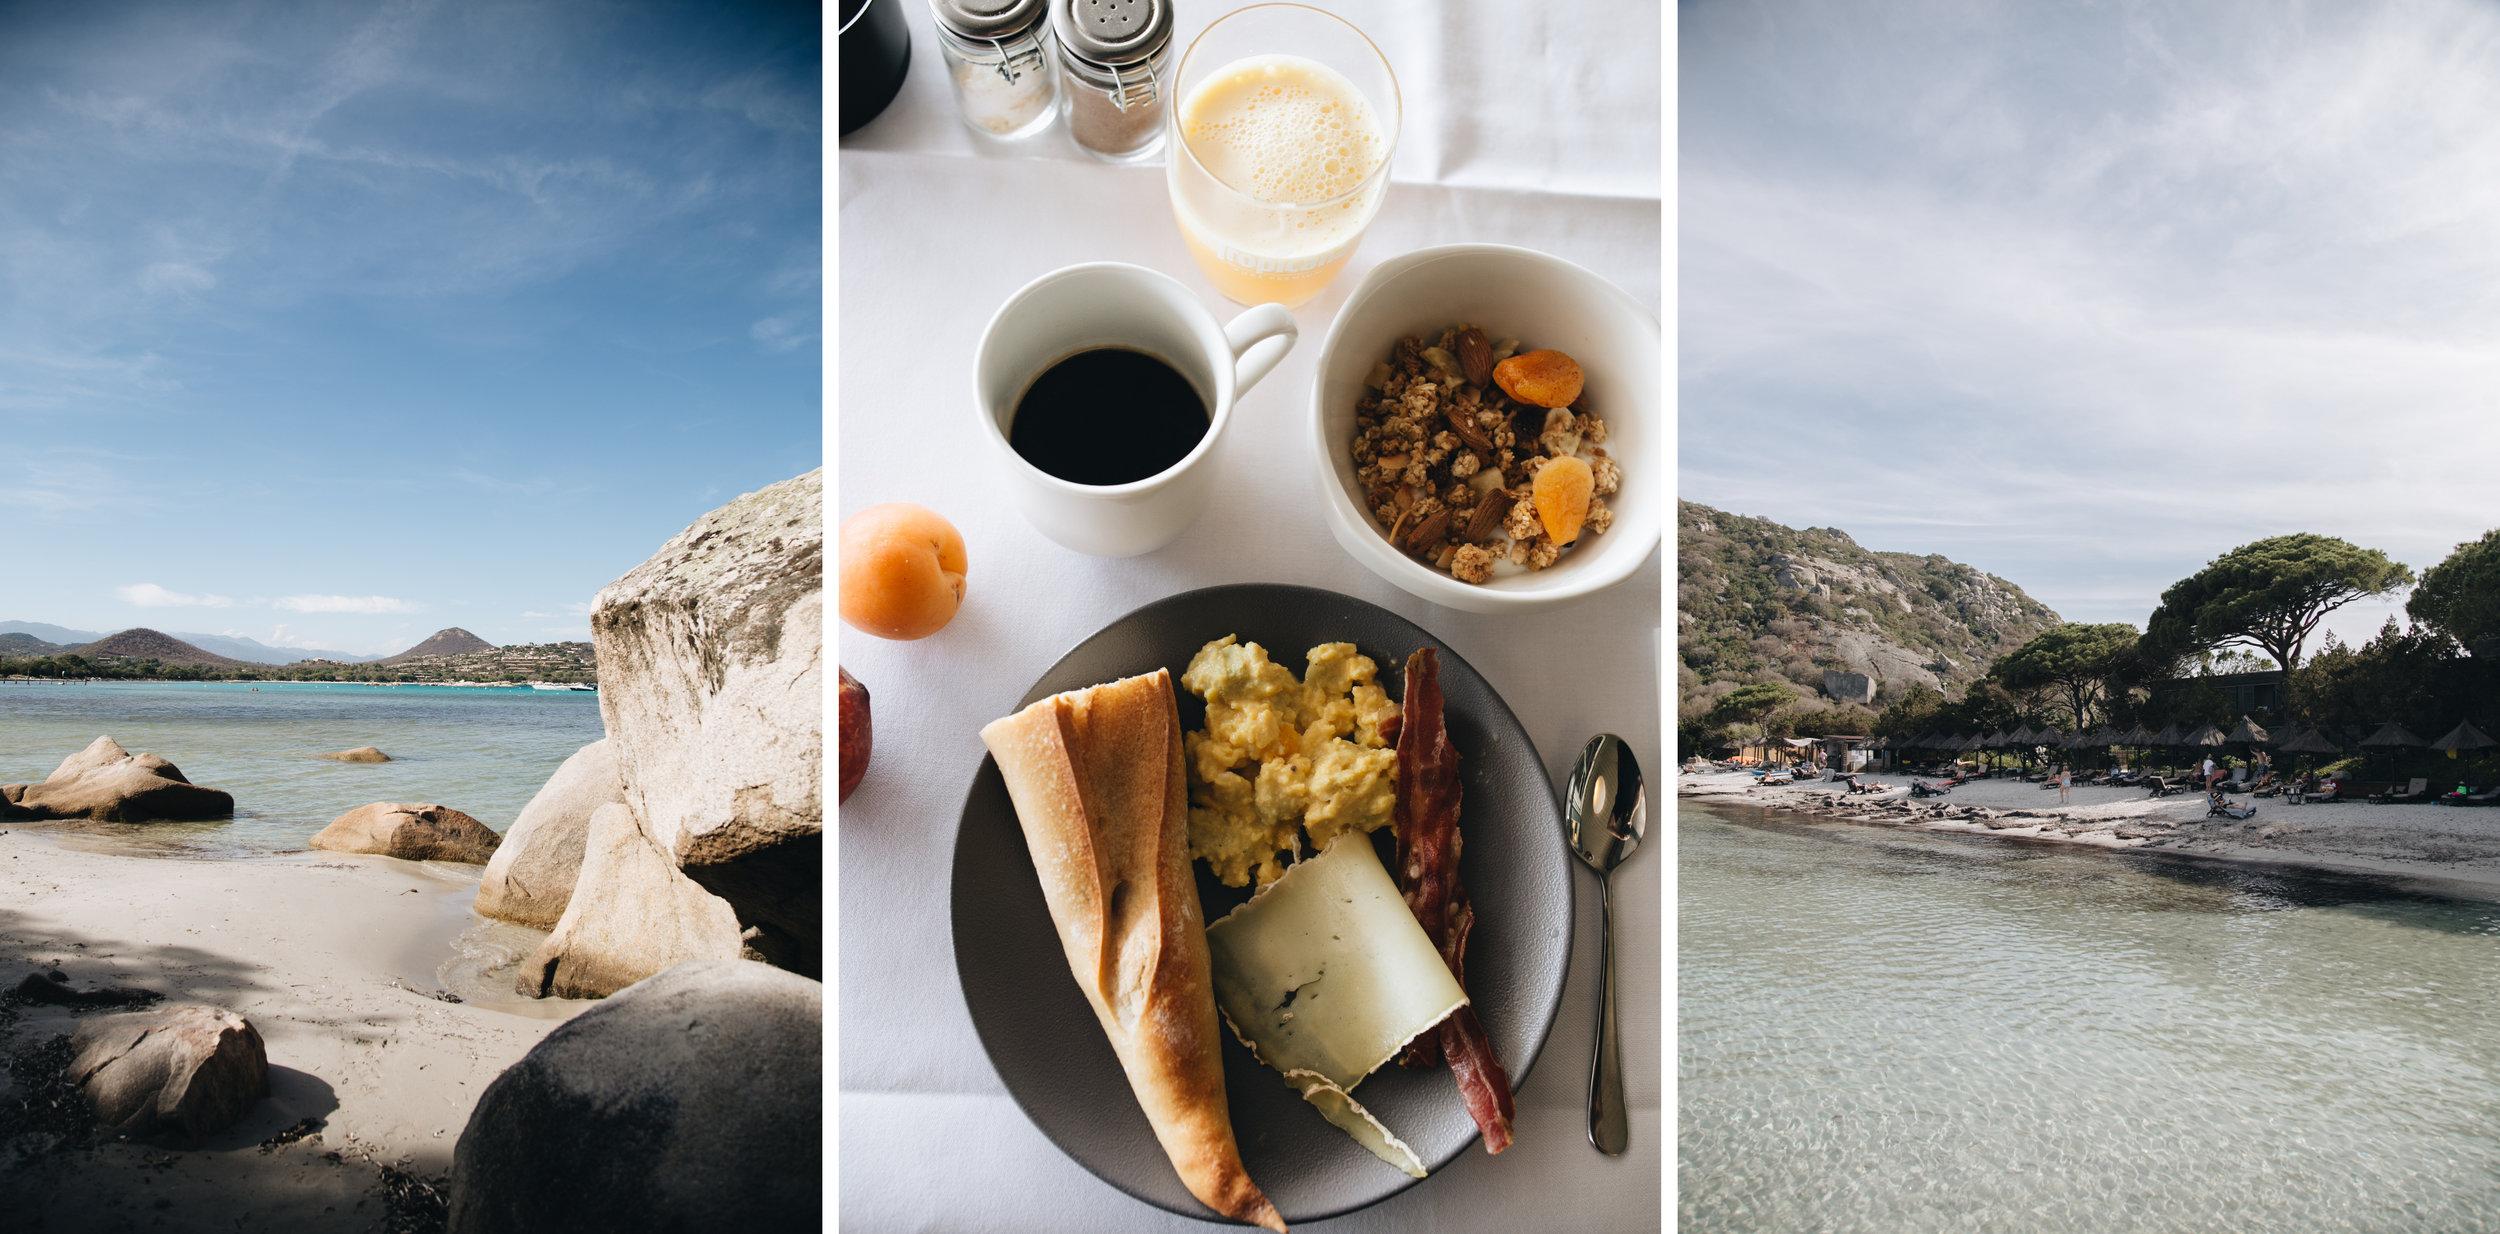 moby-dick-petit-dejeuner-hotel-santa-giulia.jpg